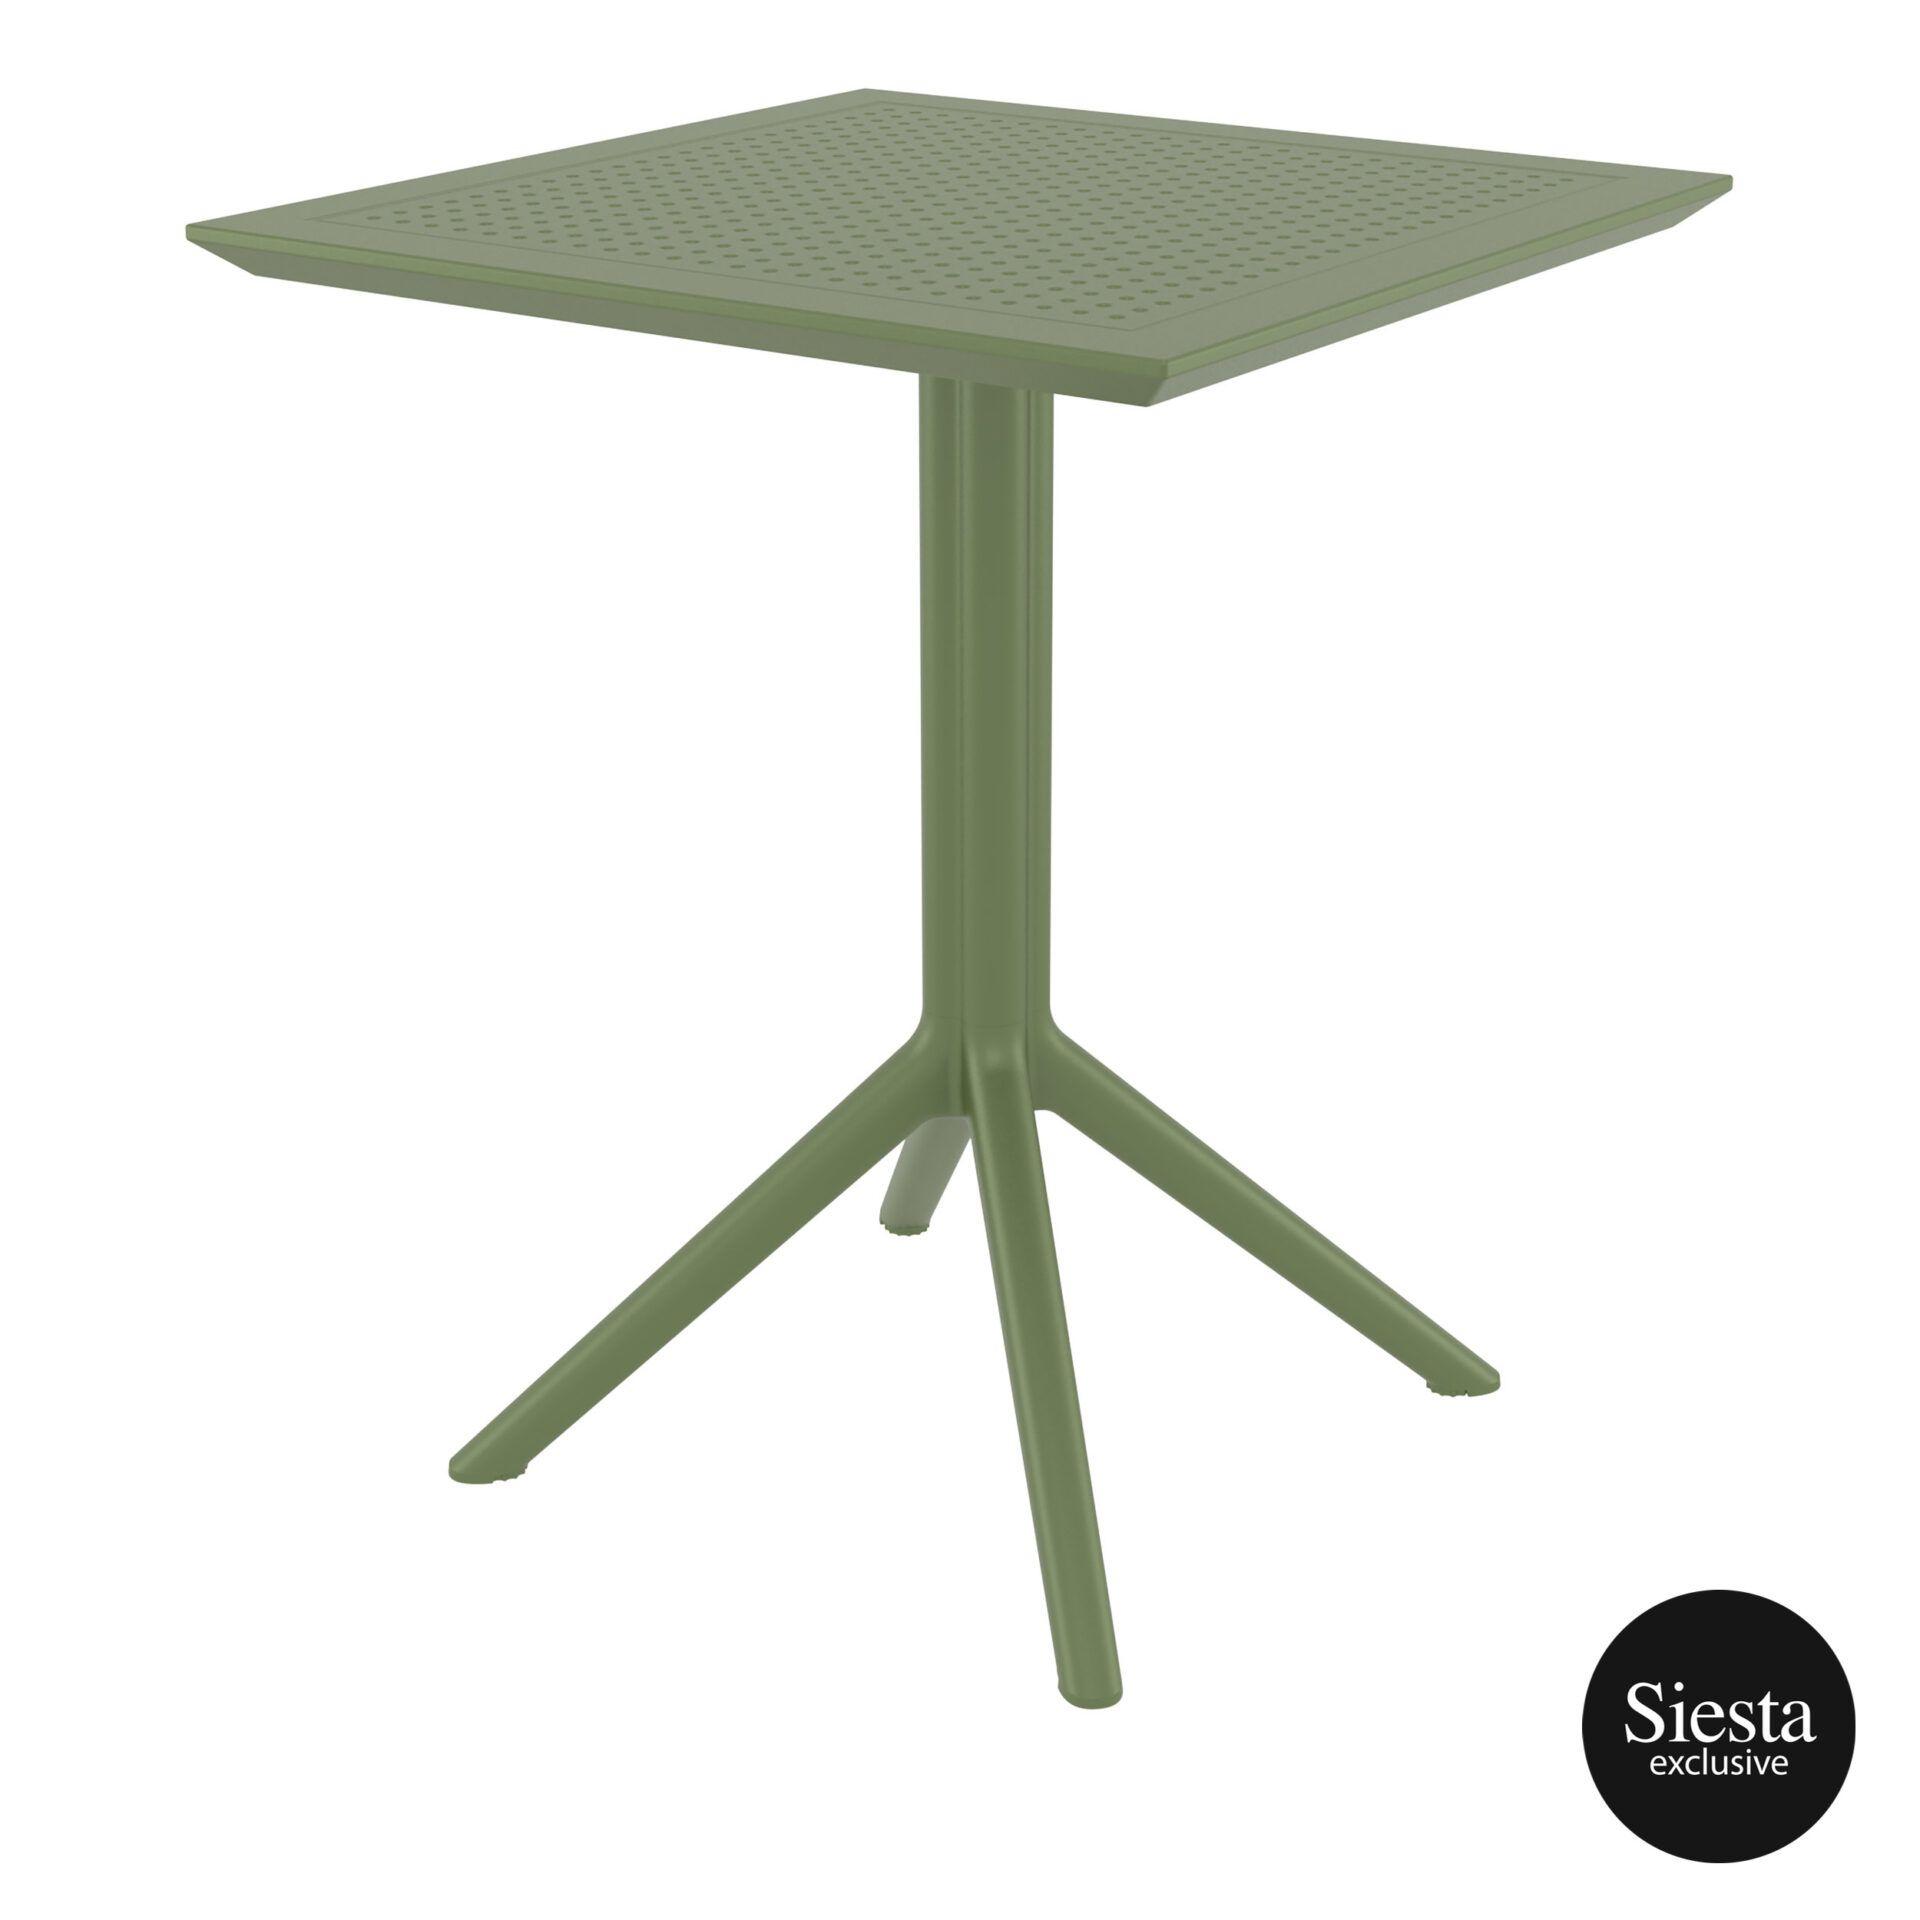 polypropylene outdoor sky folding table 60 olive green front side